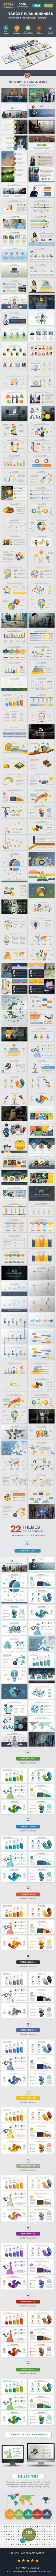 Target Plan Business Powerpoint Template - Business PowerPoint Templates